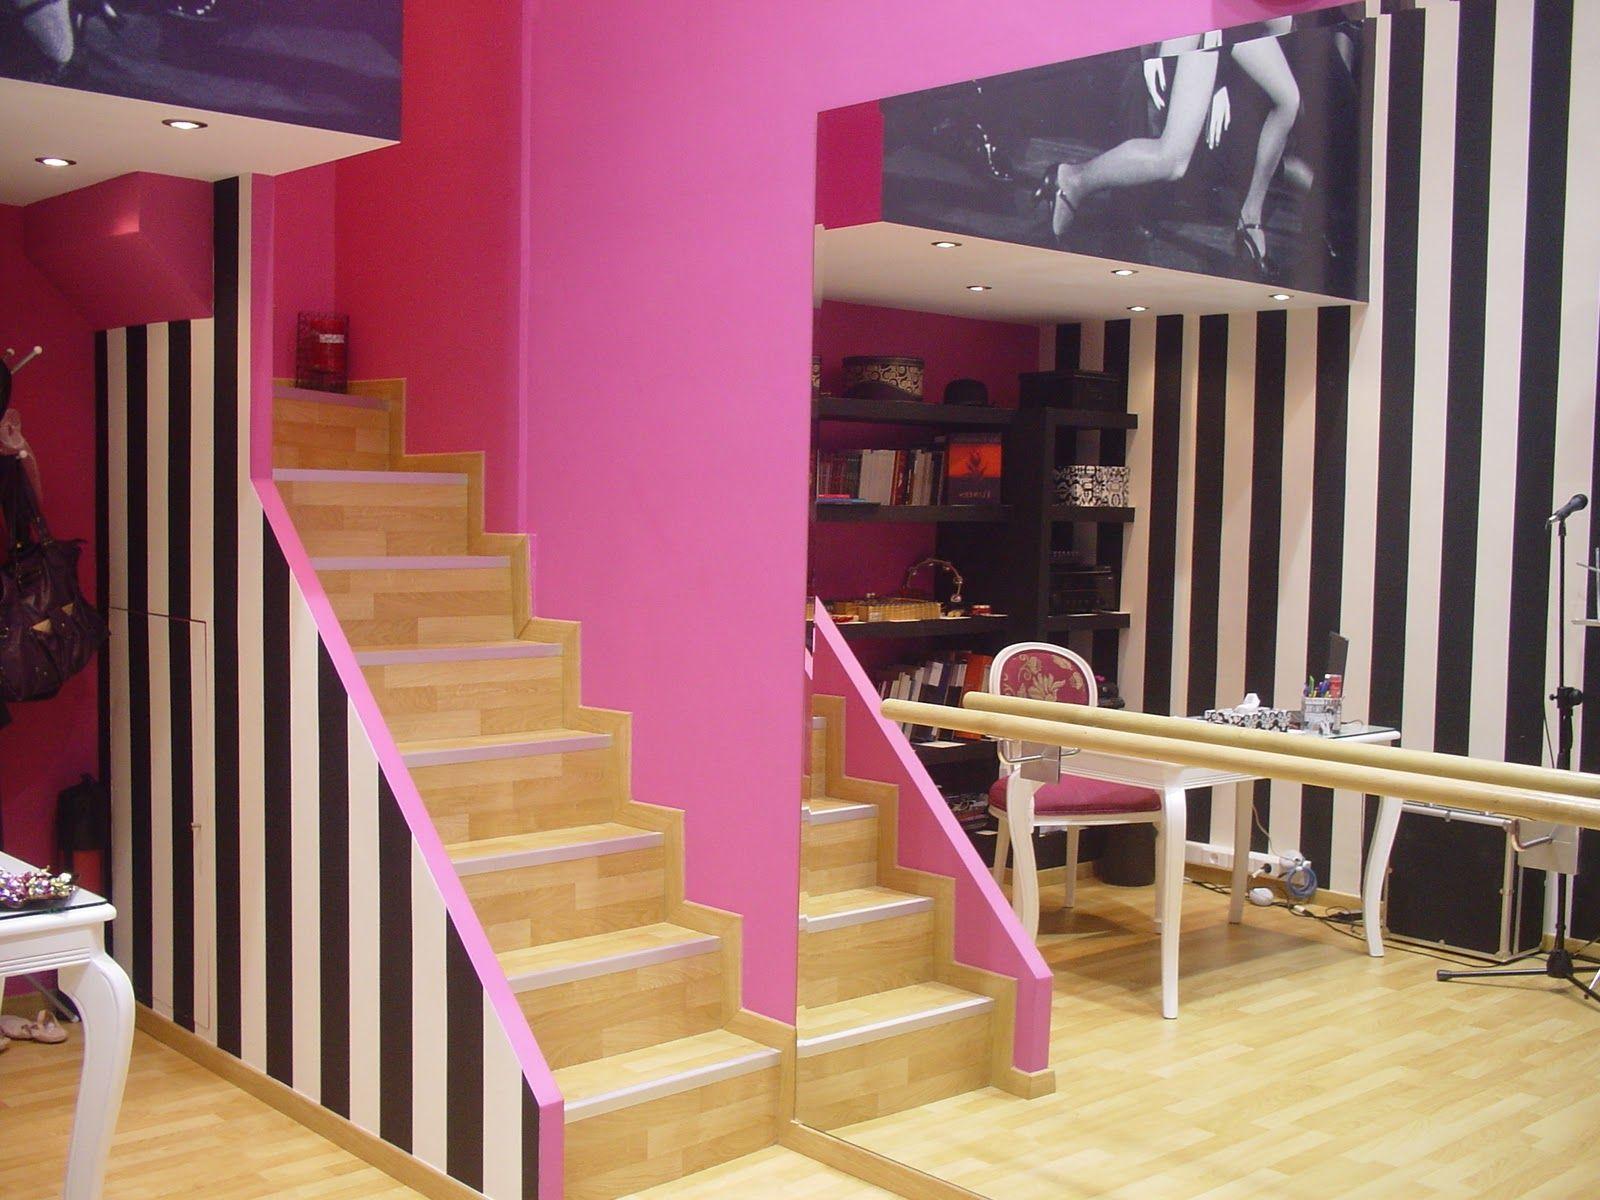 Dance Studio Design Ideas Home Art Dma Homes: Pin By American Dreamers On Dance/Yoga Room